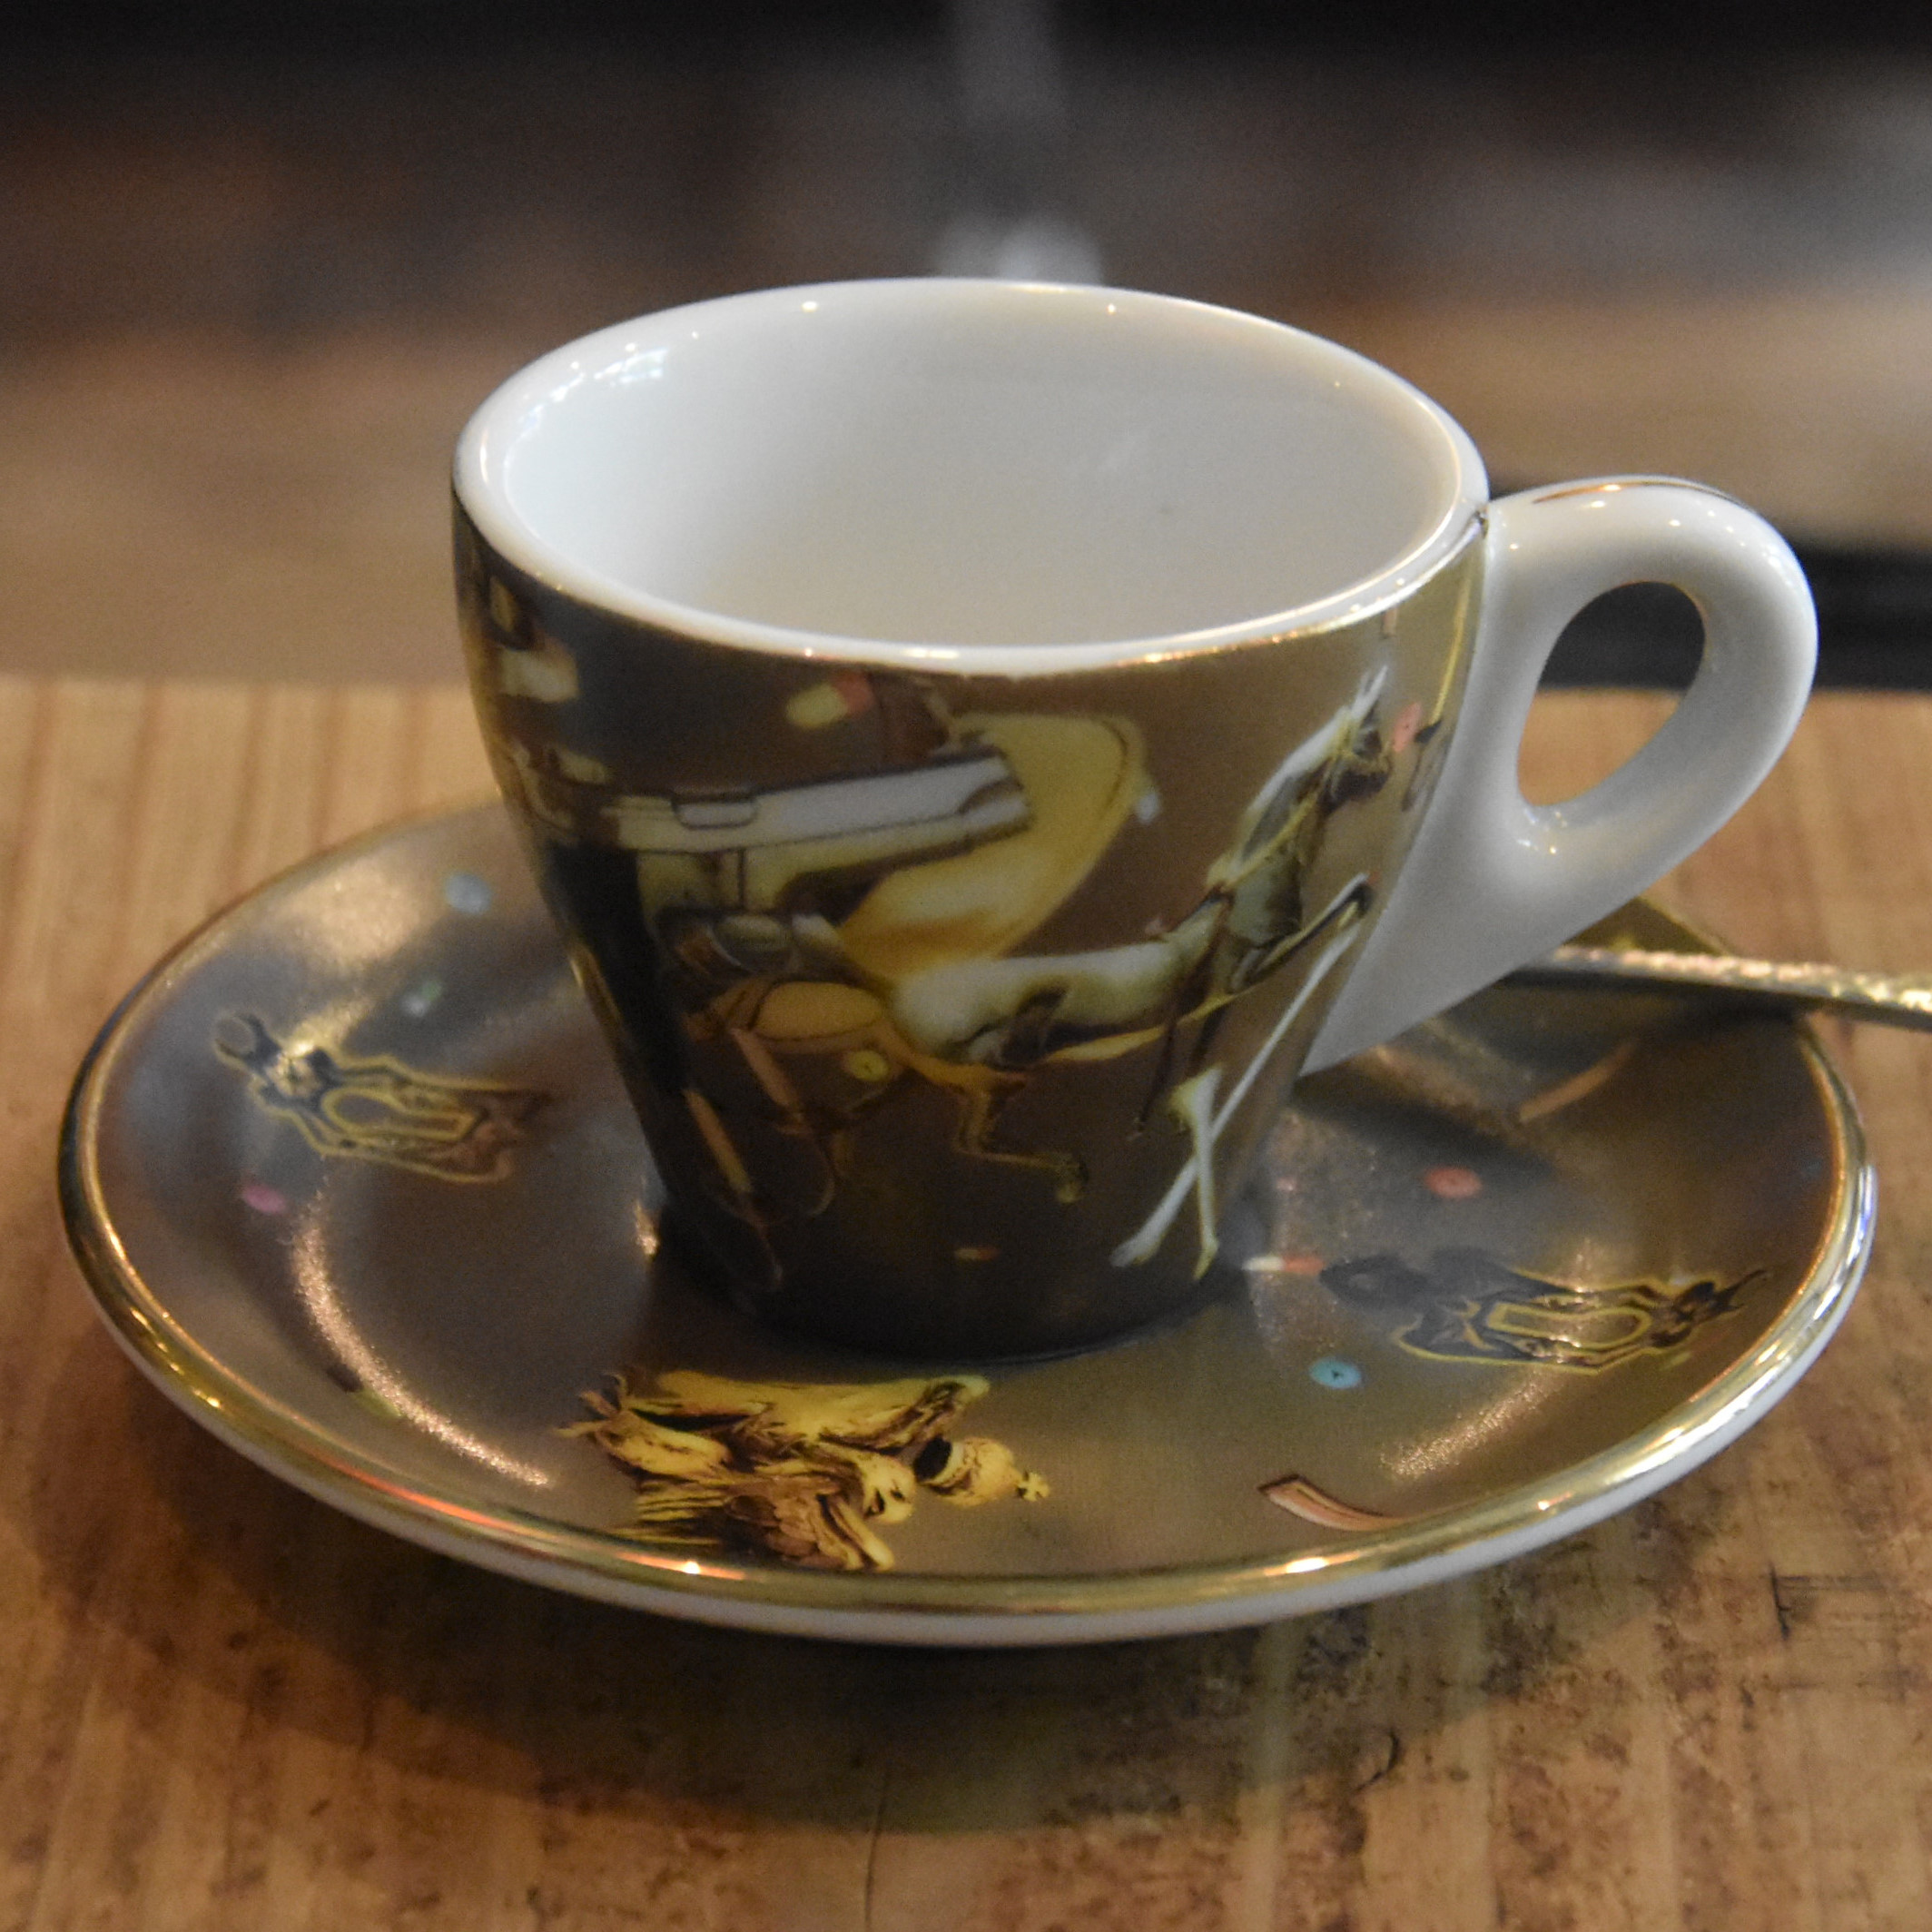 One of the lovely espresso cups at Sarutahiko Coffee Ebisu